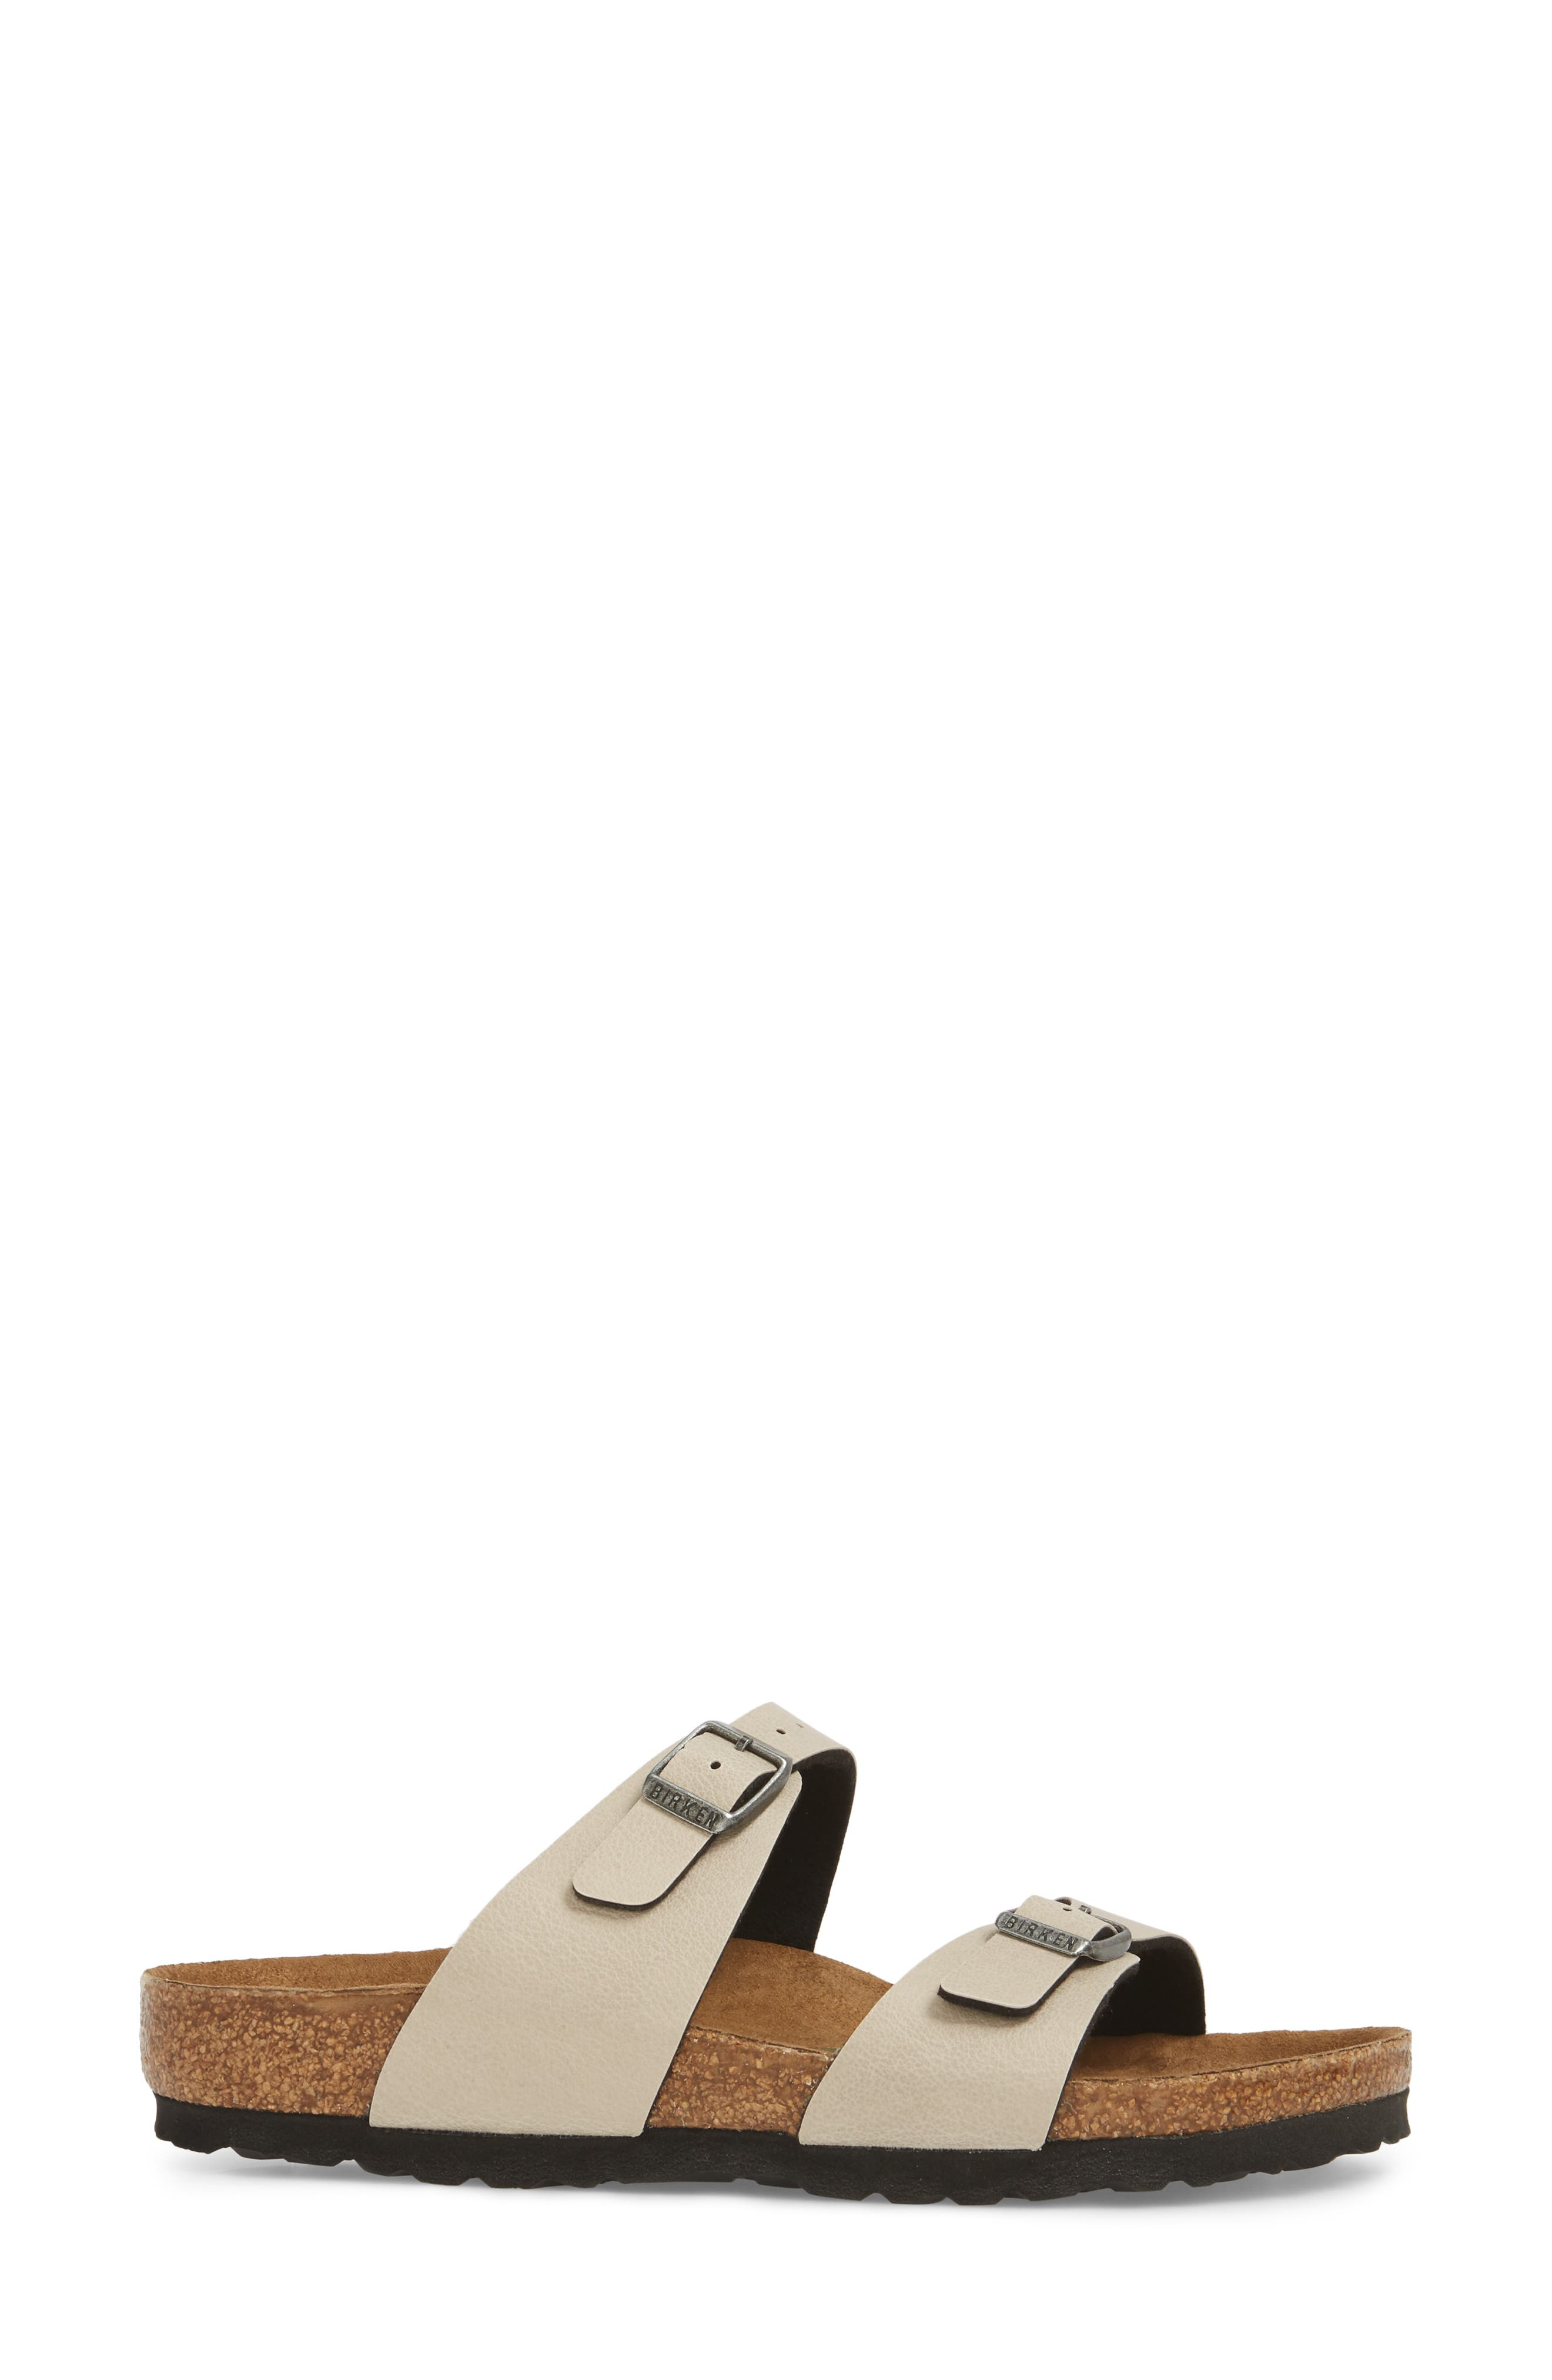 'Sydney' Sandal,                             Alternate thumbnail 3, color,                             Stone Leather